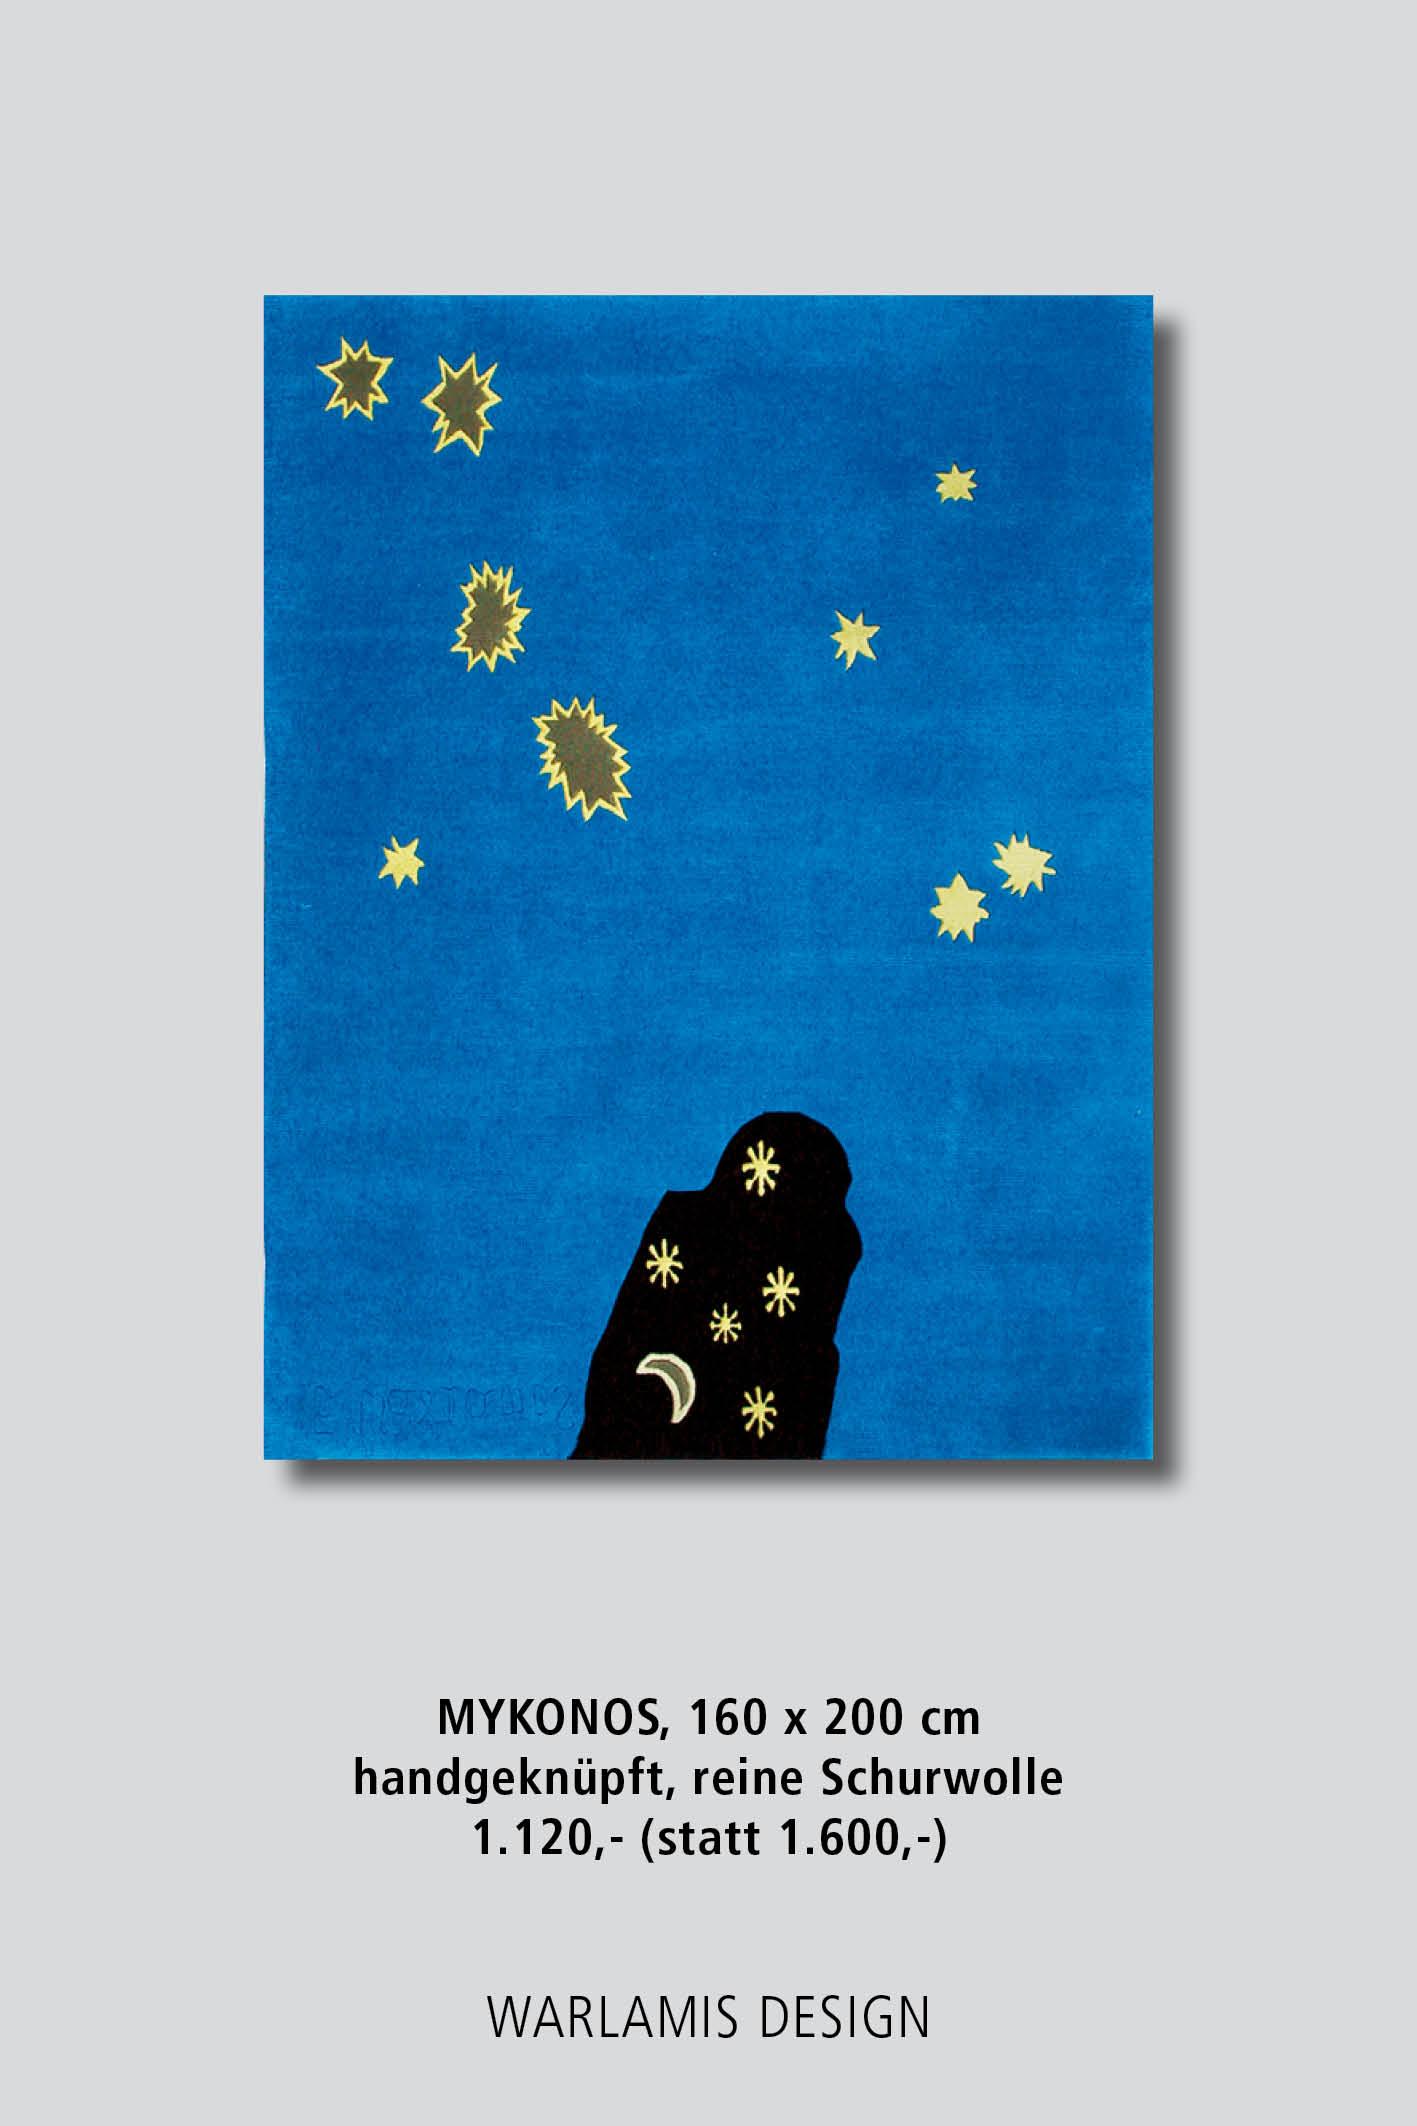 2018 Mykonos.jpg